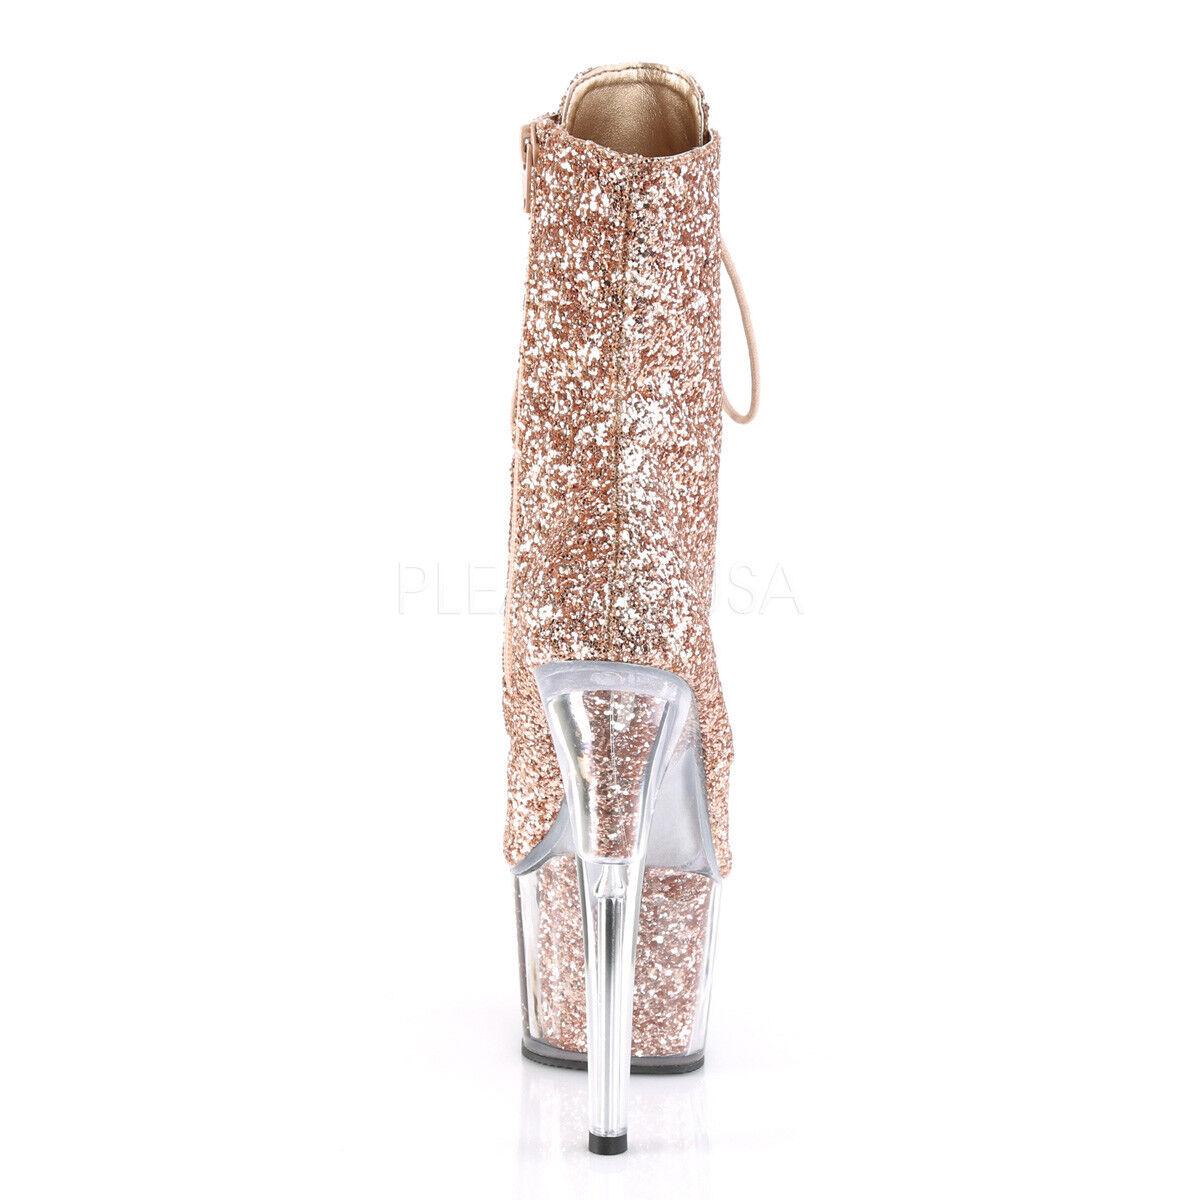 PLEASER Sexy ADORE-1020G 7  Heel Platform Rosa Rosa Rosa Gold Glitter damen Ankle Stiefel 16e3b1